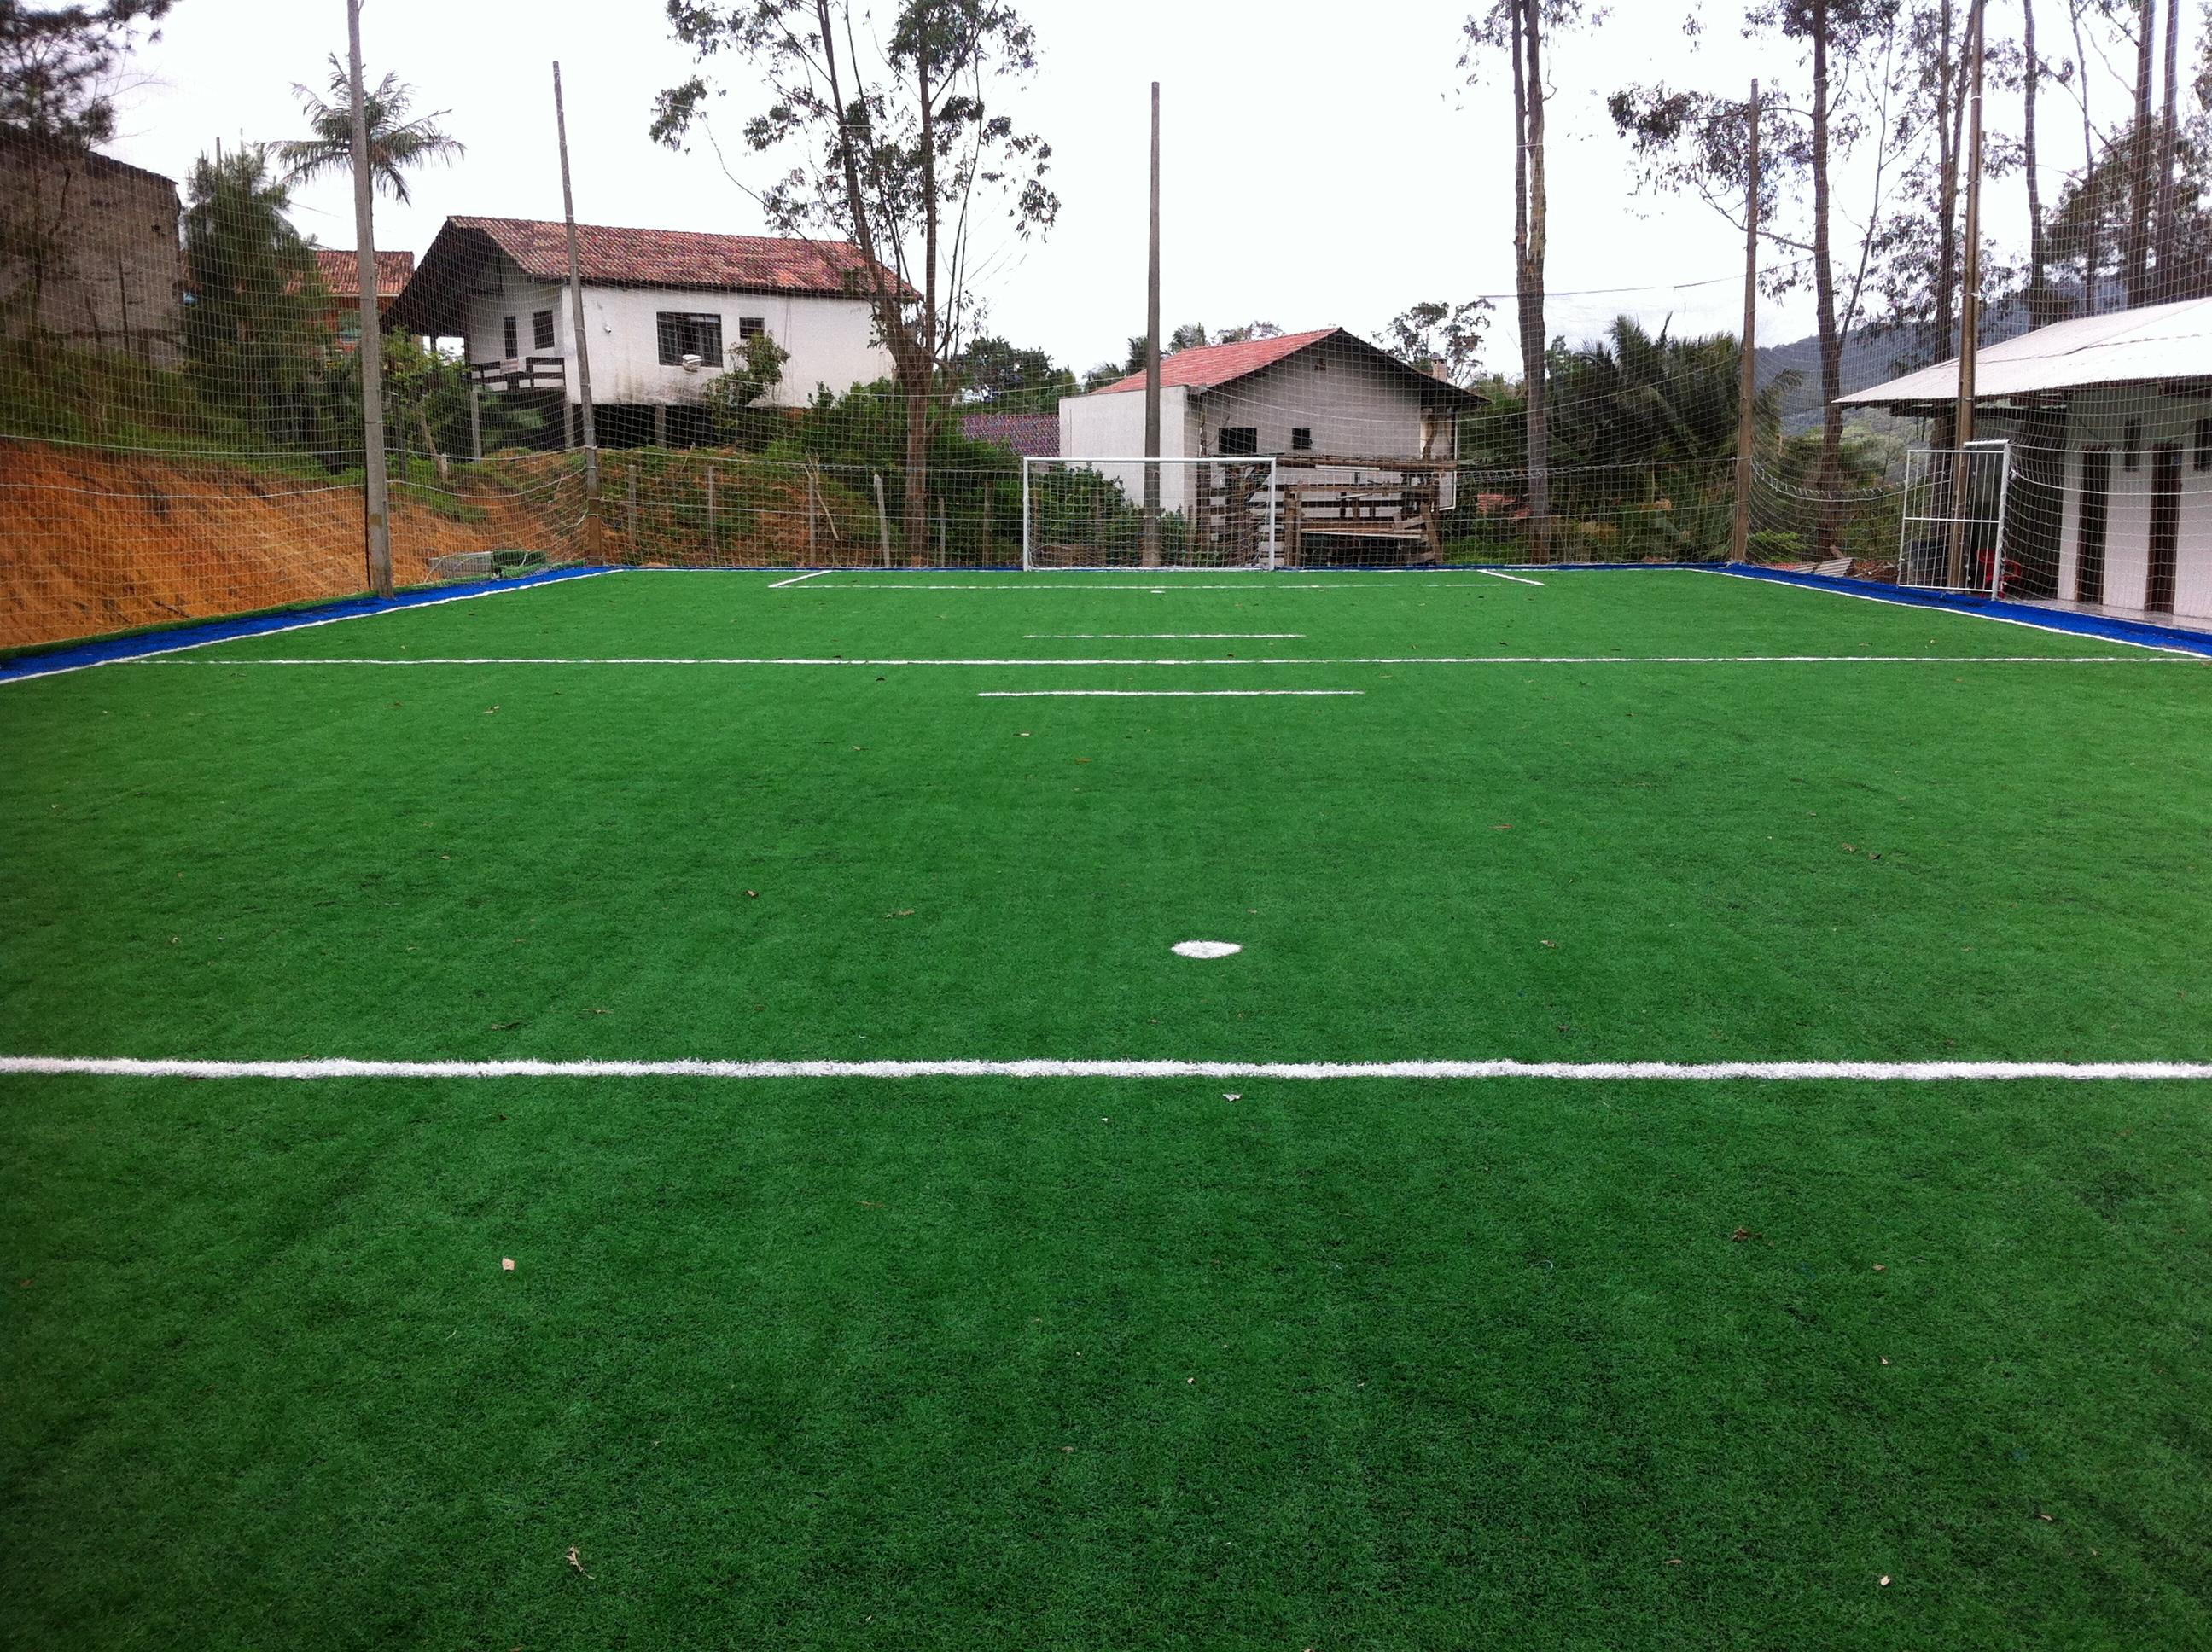 Arena Society - Quadra de grama sintética - Blumenau / Santa Catarina